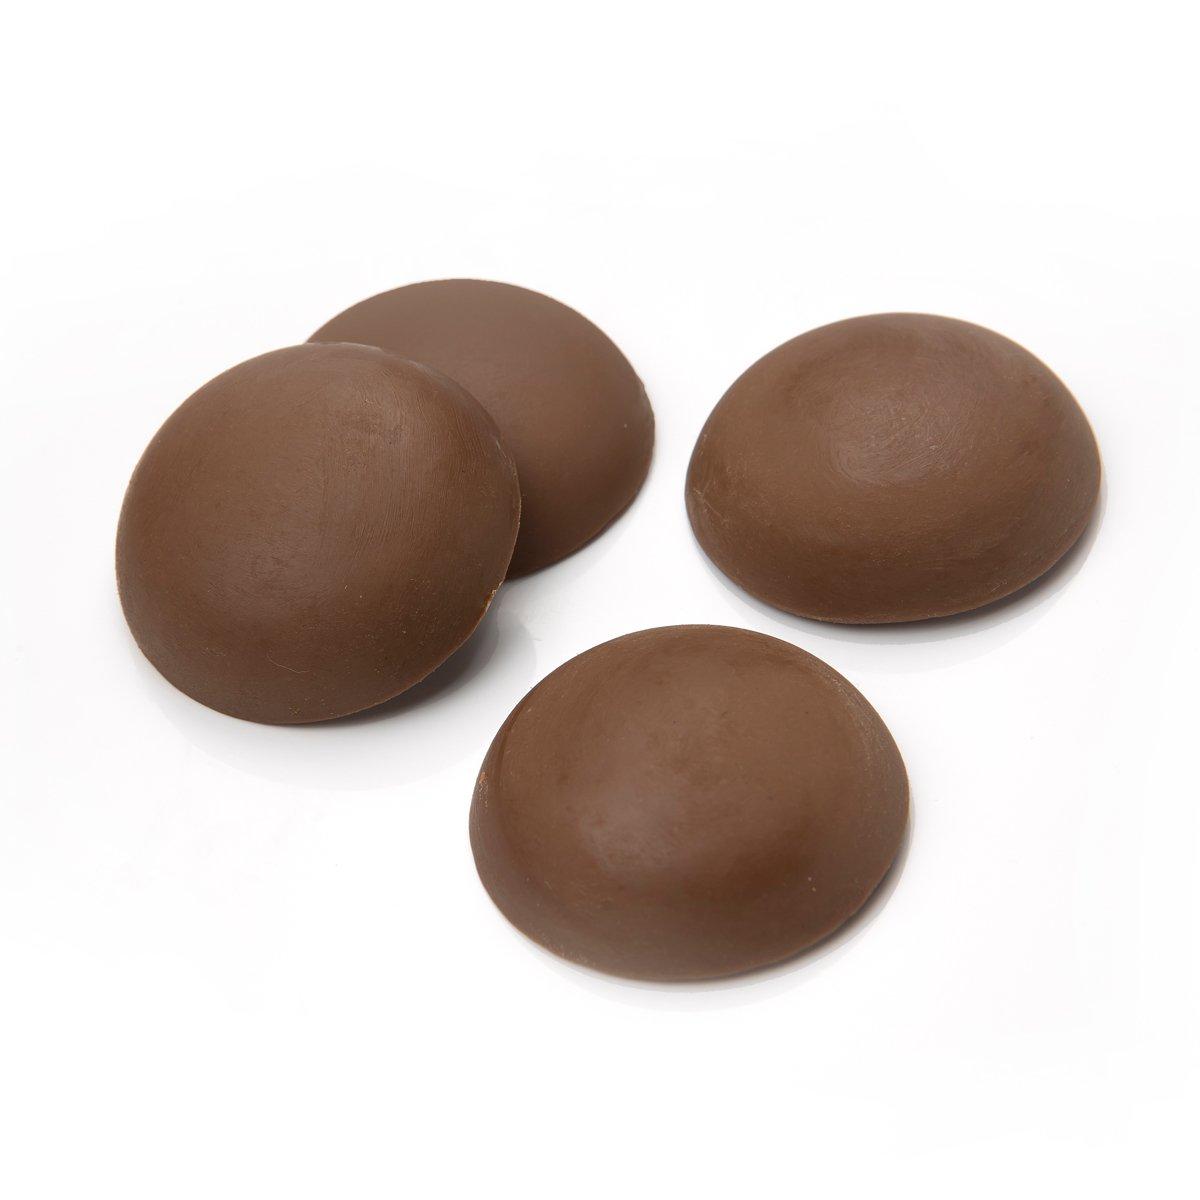 OVALETTE Sütlü Para Çikolata 1 KG